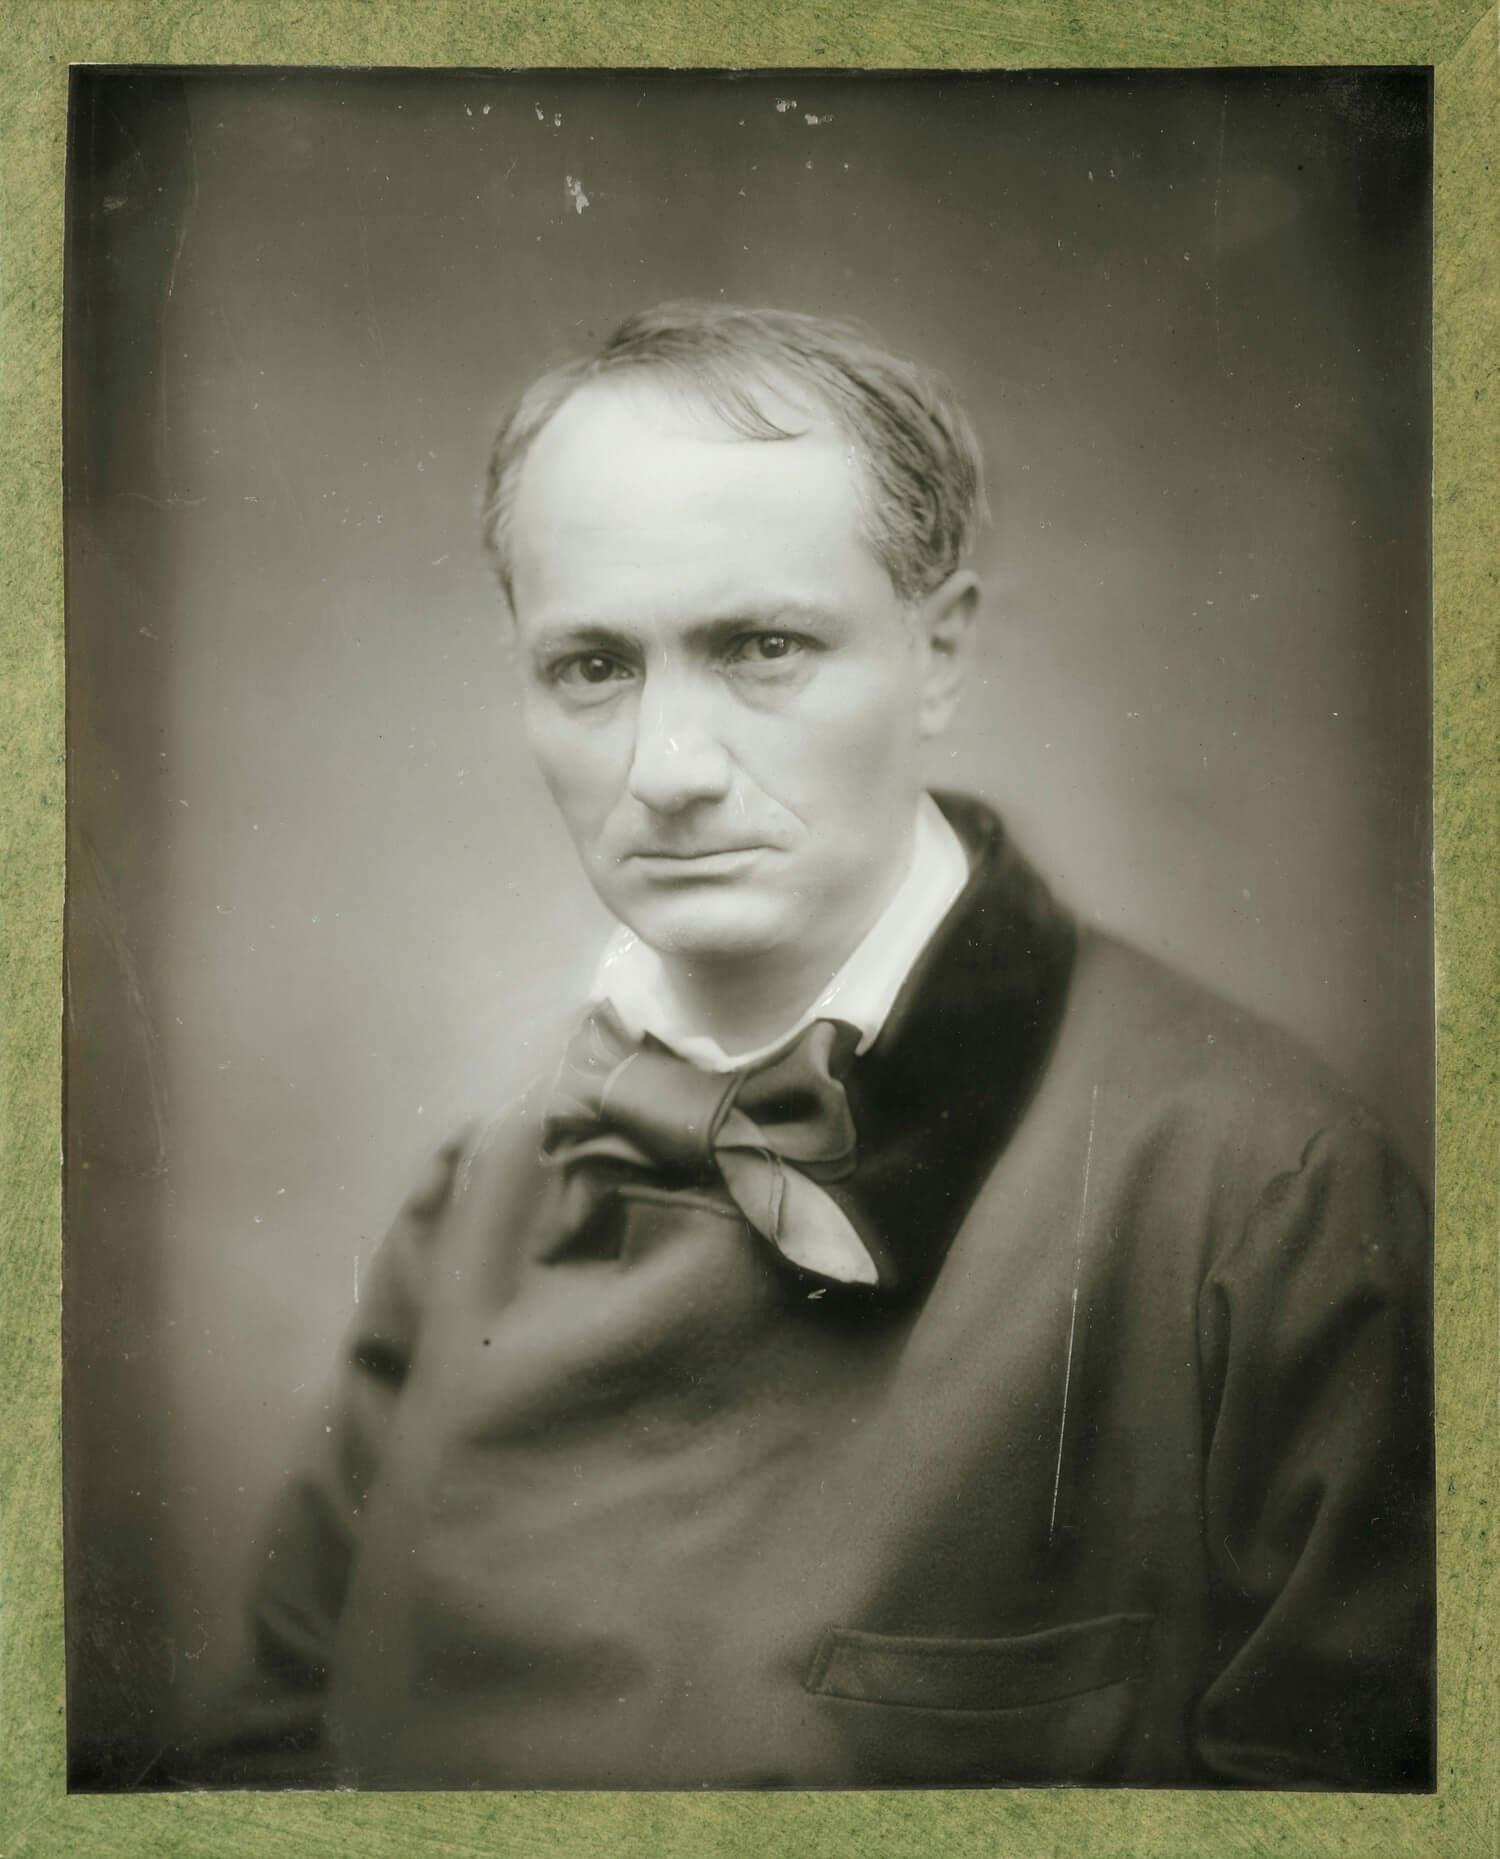 Étienne Carjat (1828-1906).Correspondentie Charles Baudelaire. Vertaling correspondentie Baudelaire, vertalingen Vivienne Stringa.